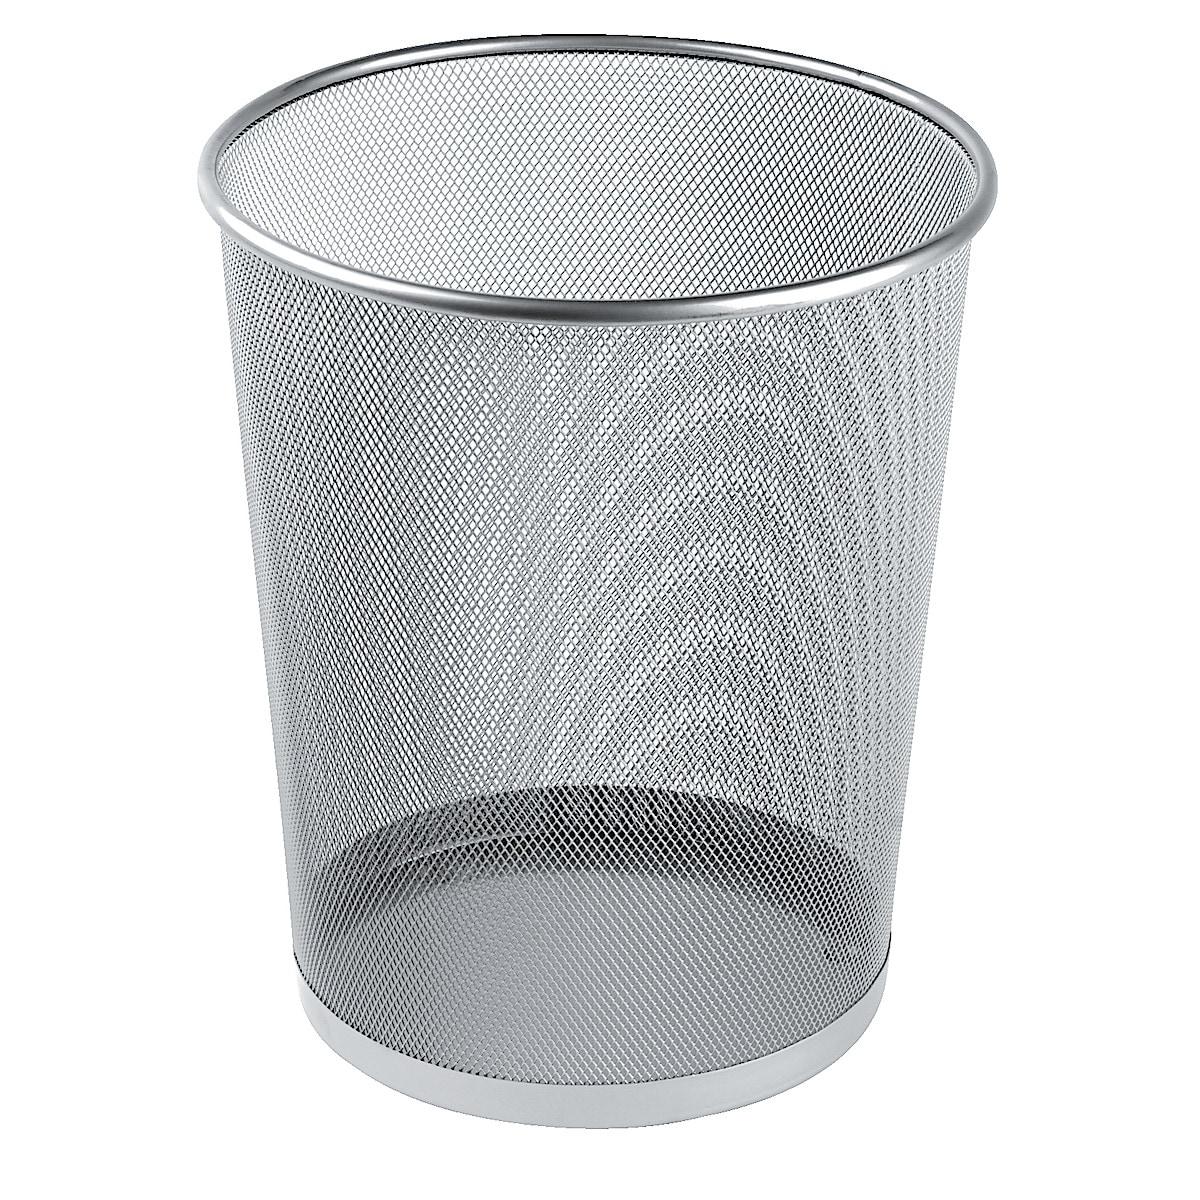 Papperskorg metall silver